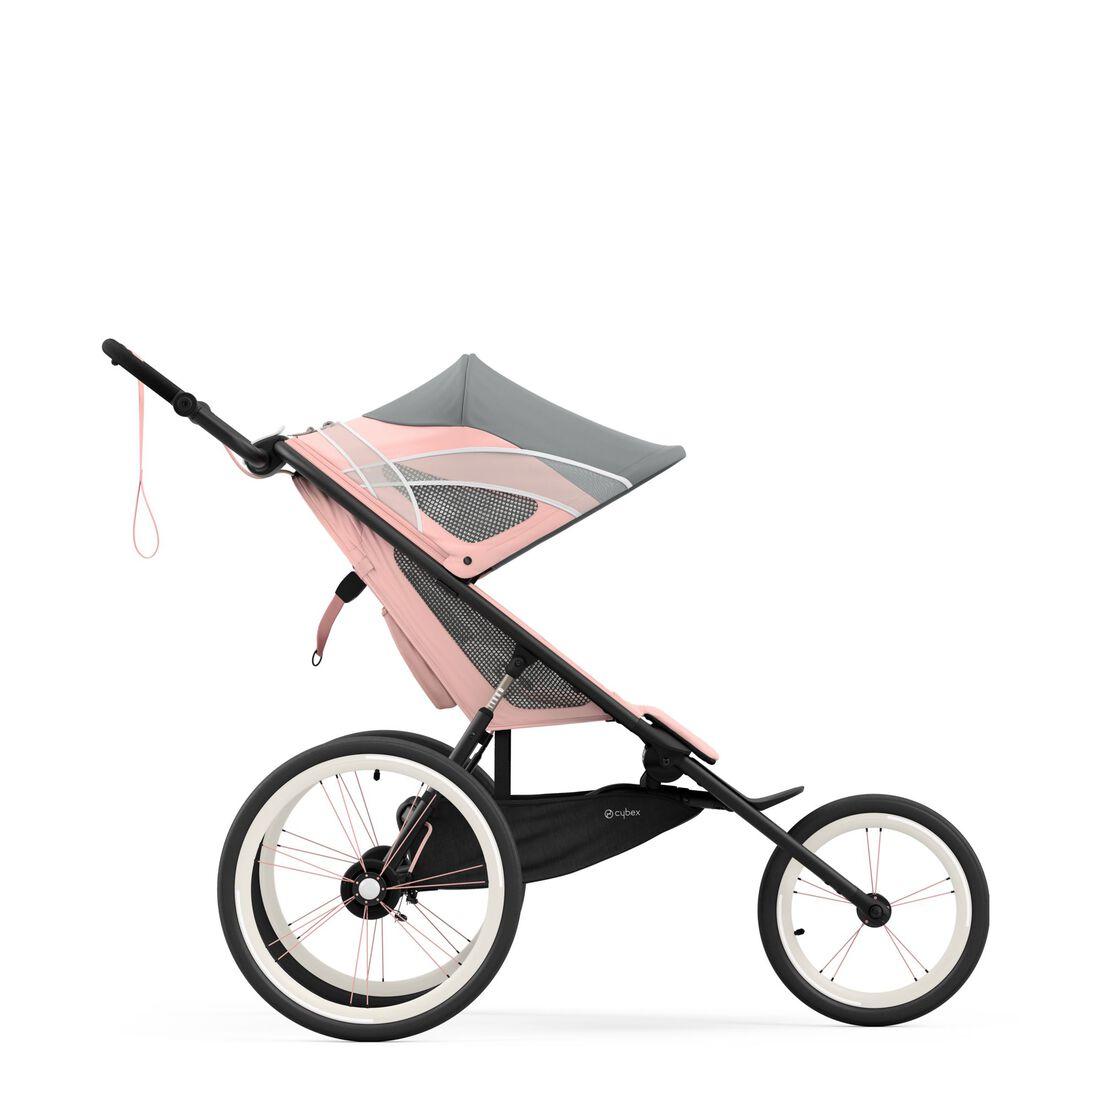 CYBEX Avi Sitzpaket - Silver Pink in Silver Pink large Bild 4